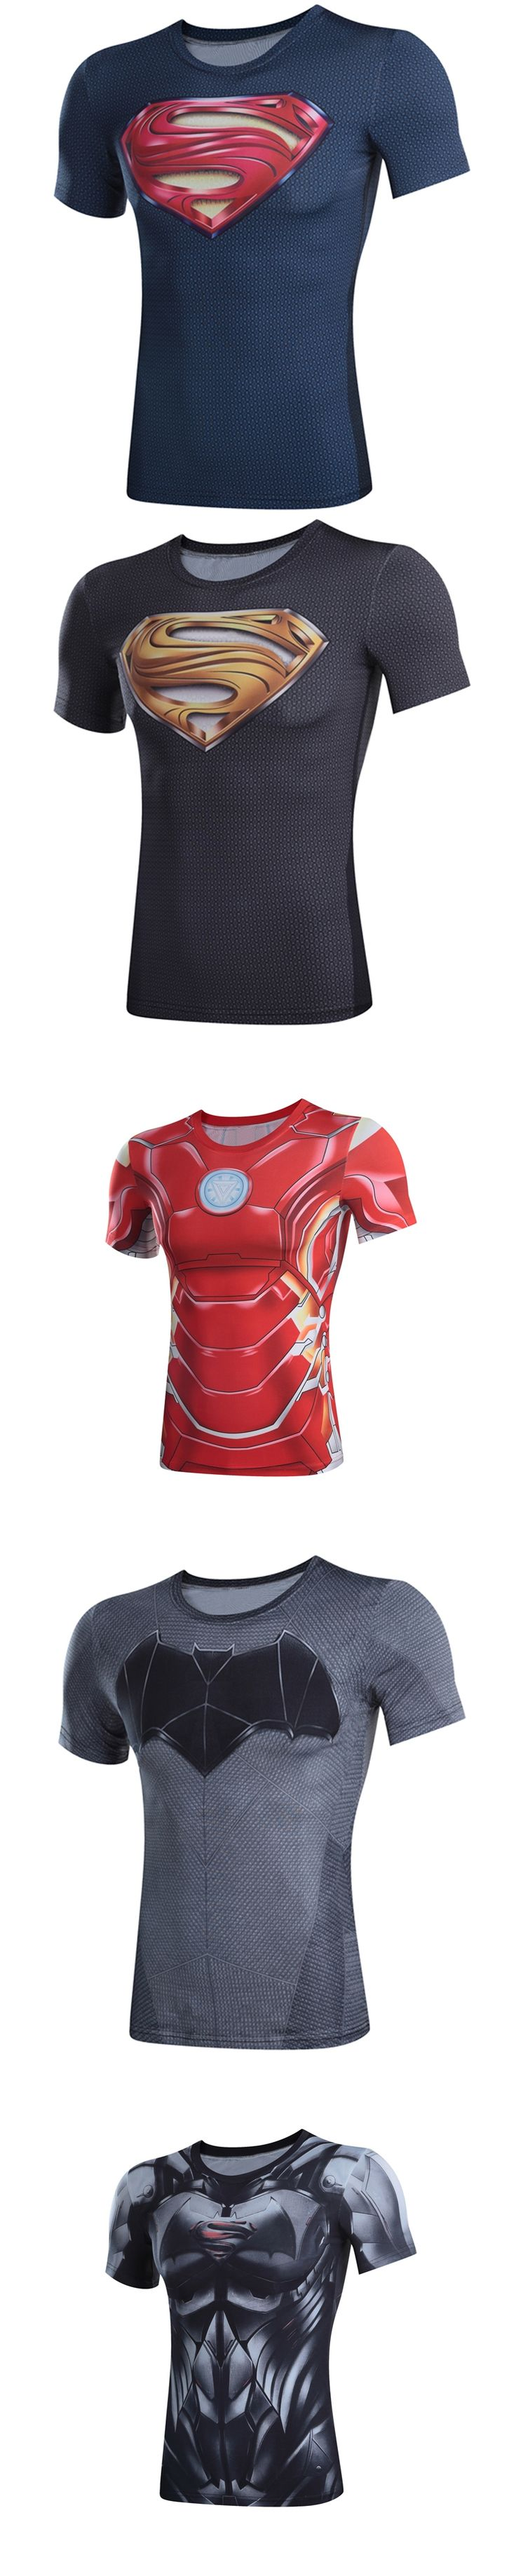 3Dt-shirts Superman captain America 3 digital printing compressed t-shirts men Deadpool iron Man Short sleeve model